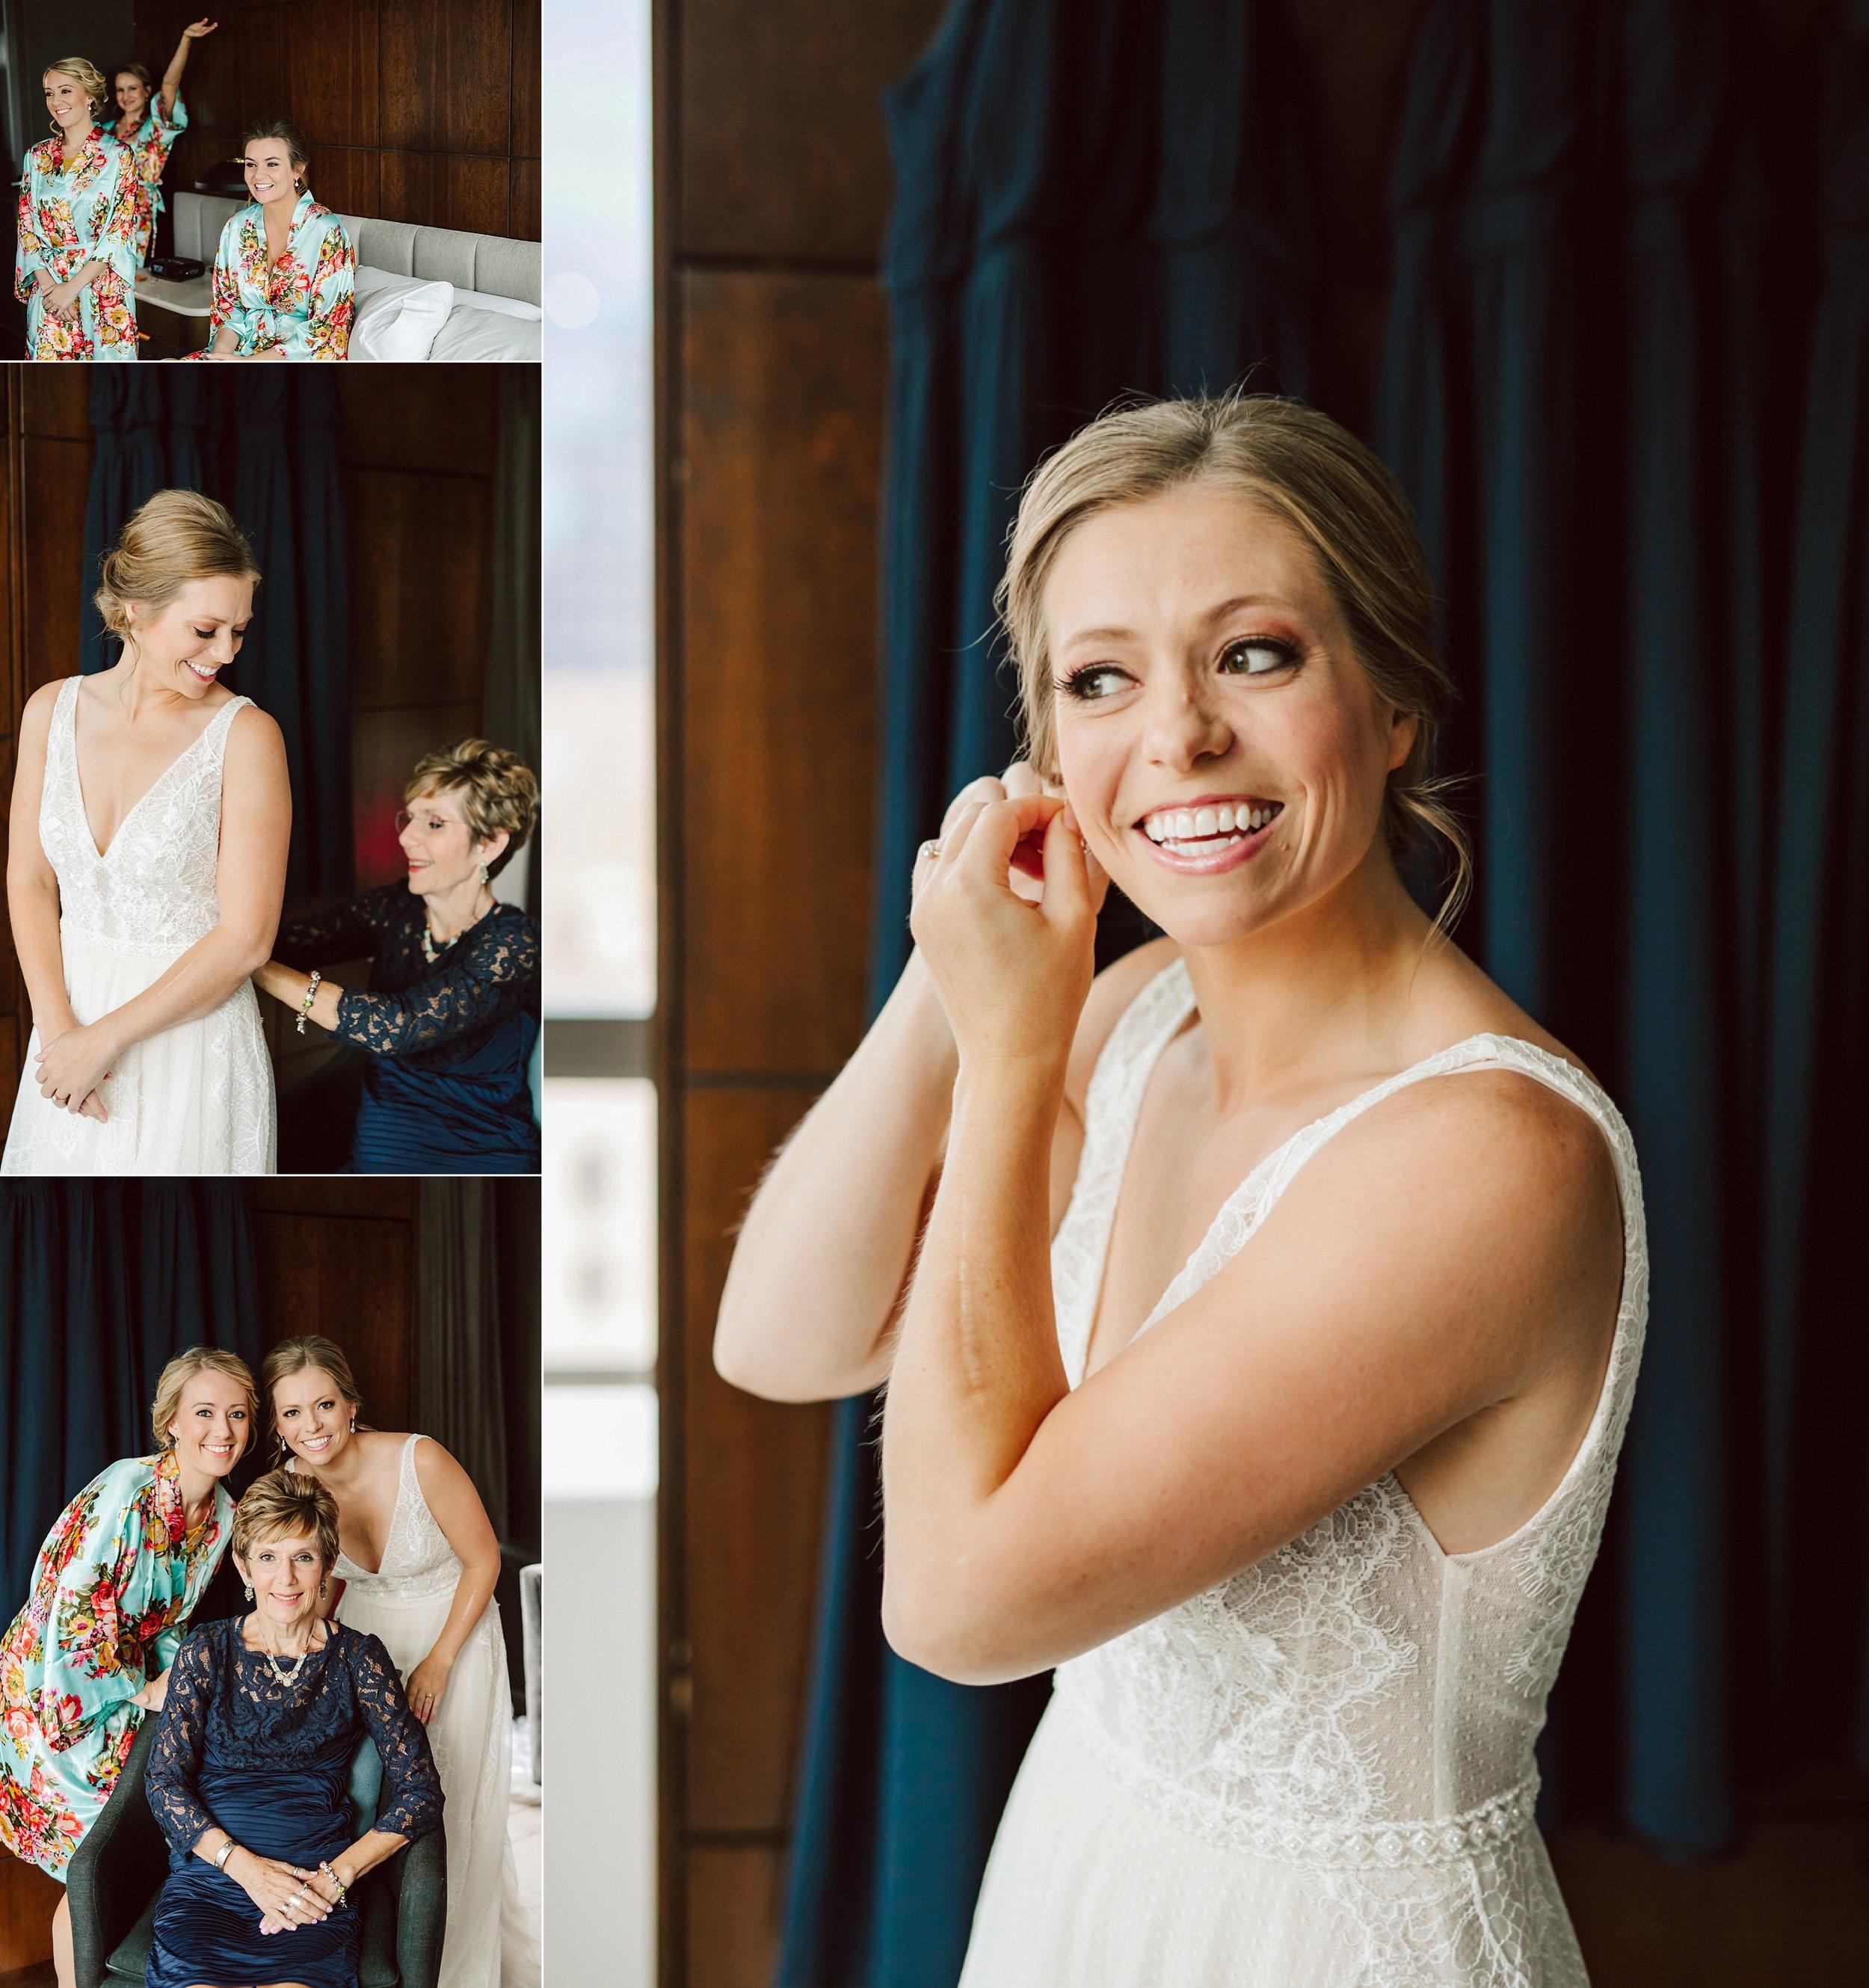 Nicollet-Island-Pavilion-Minneapolis-September-Coral-Navy-Wedding-13.jpg